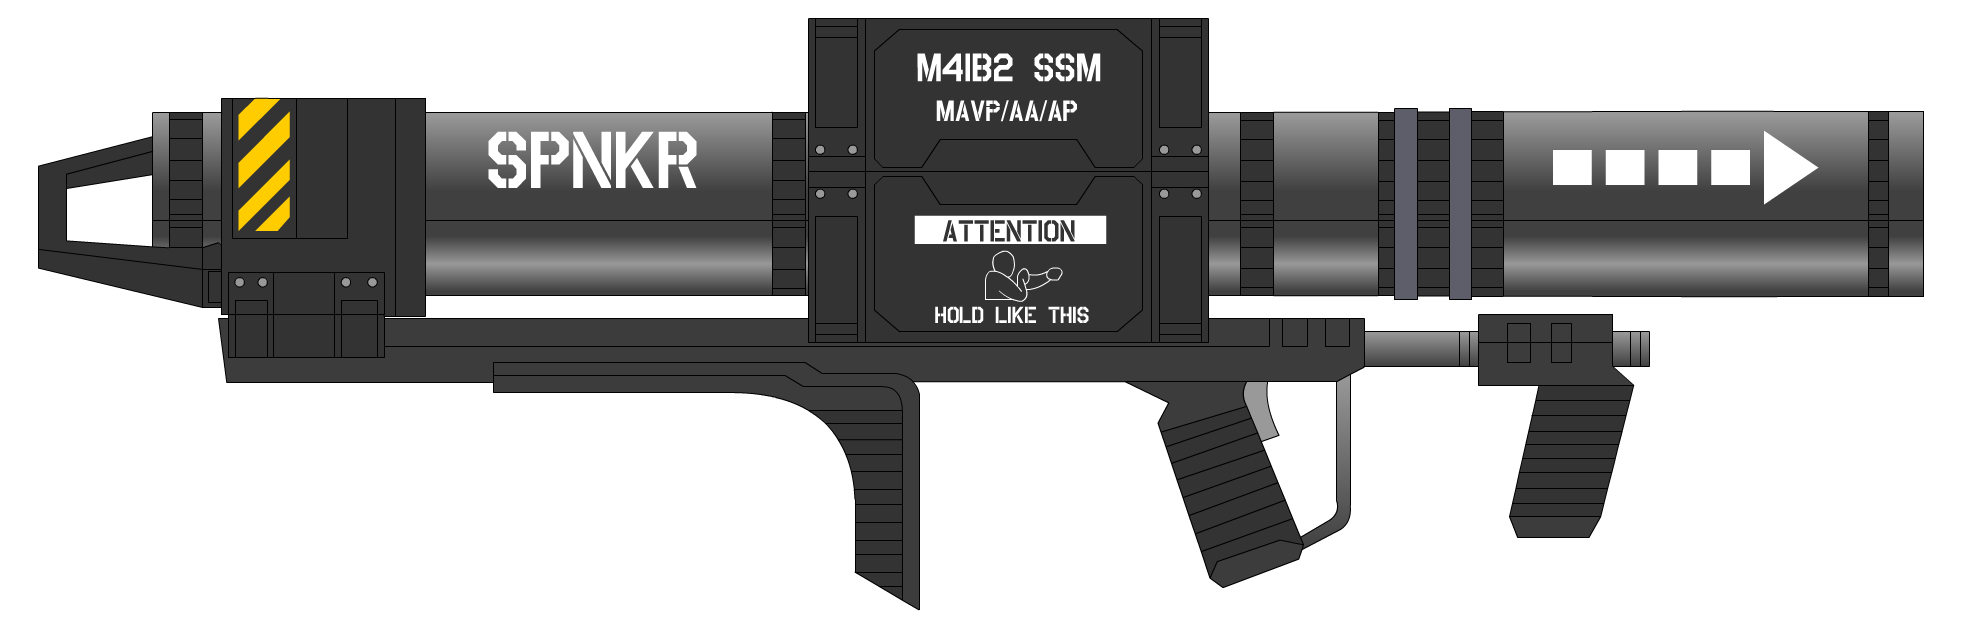 M41B2 Medium Anti-Vehicle/Assault Weapon